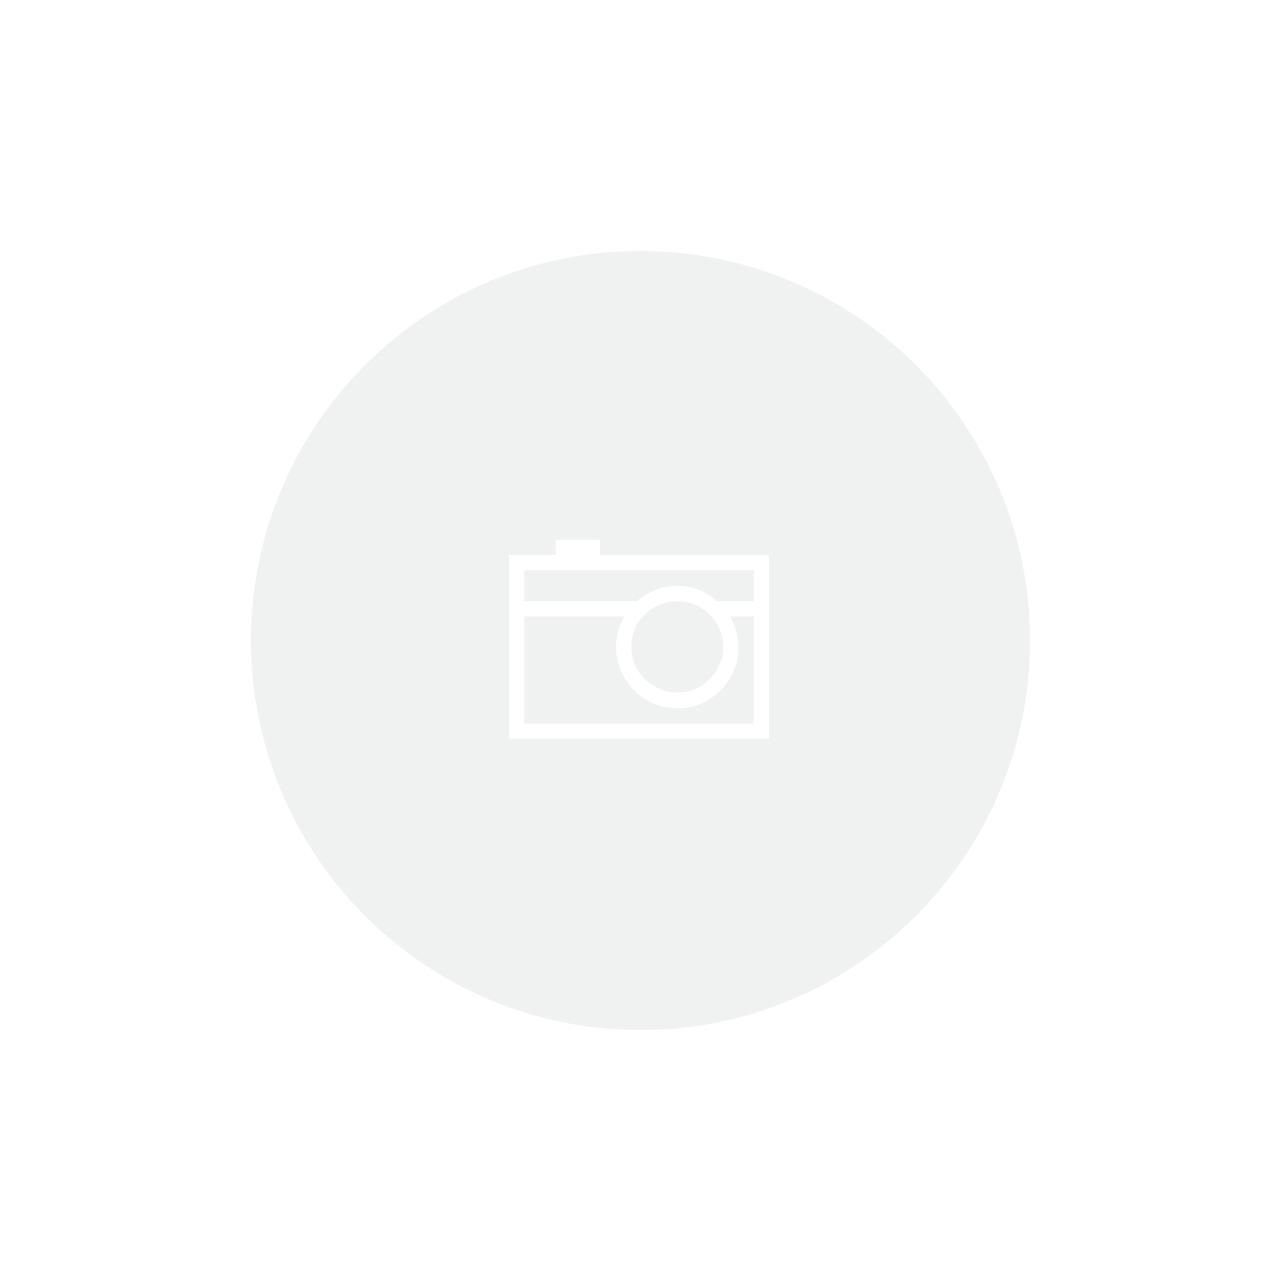 Jogo de Cama Casal Conf. Basic Premium cor Kaki